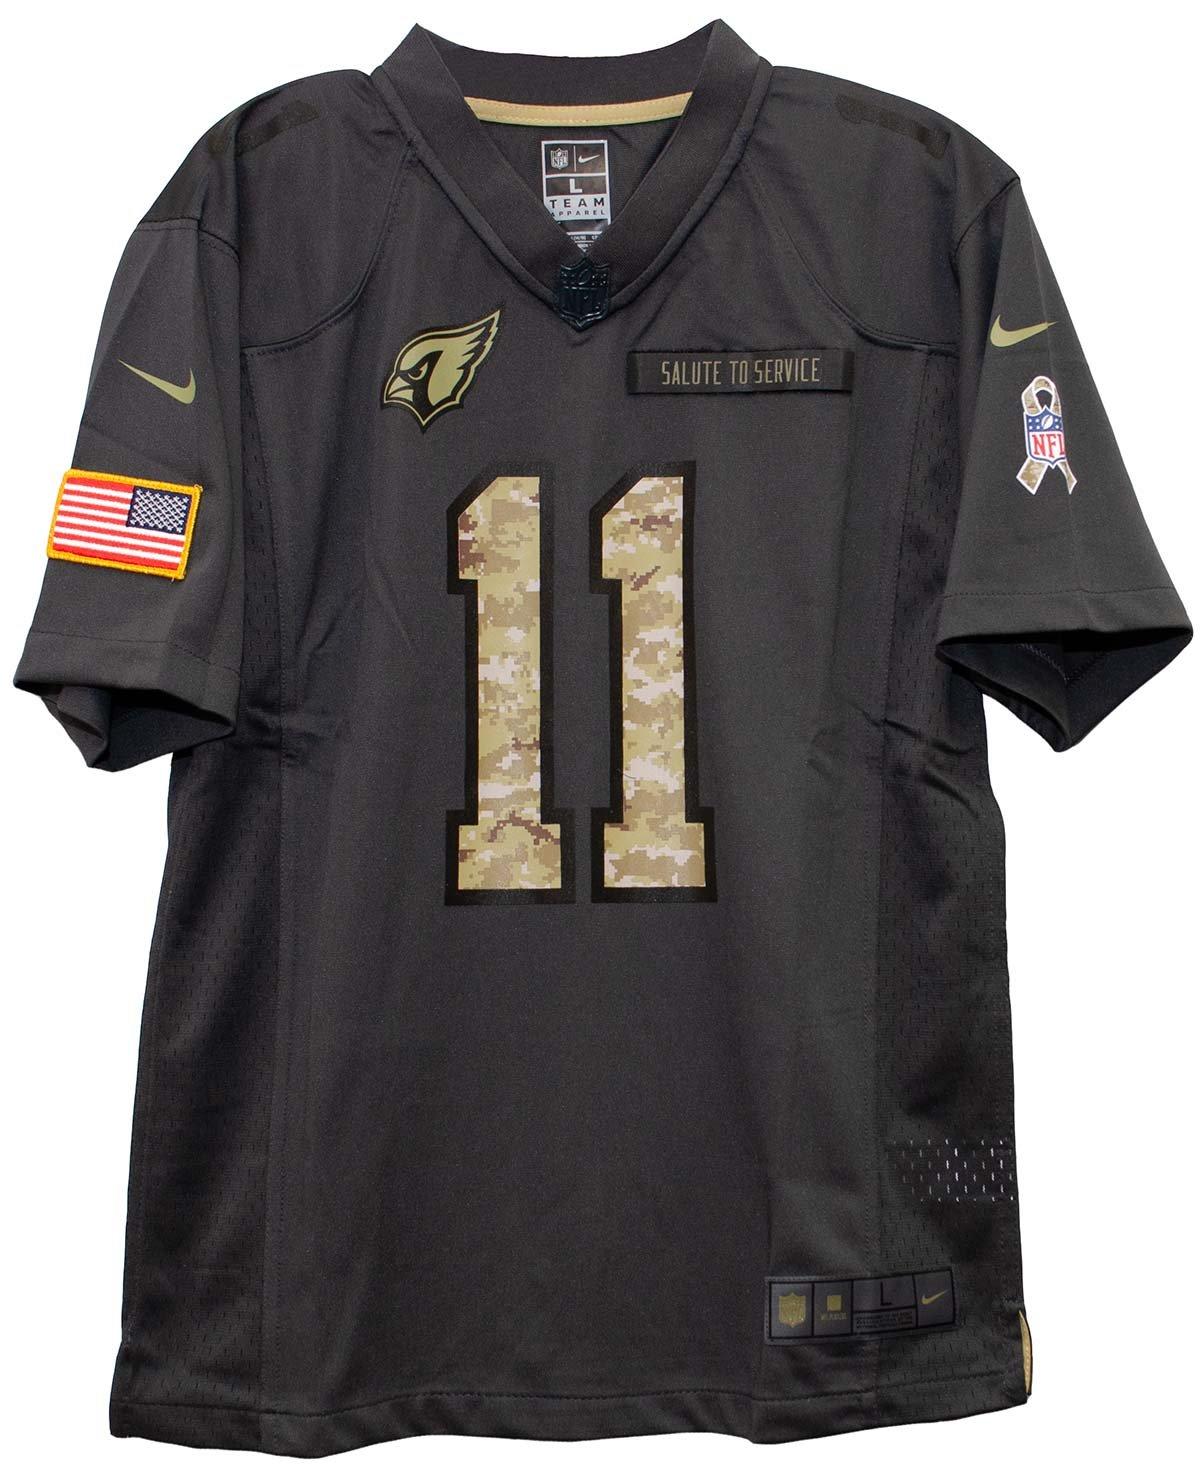 innovative design 94bb1 26c50 Amazon.com : Nike Larry Fitzgerald Arizona Cardinals Salute ...